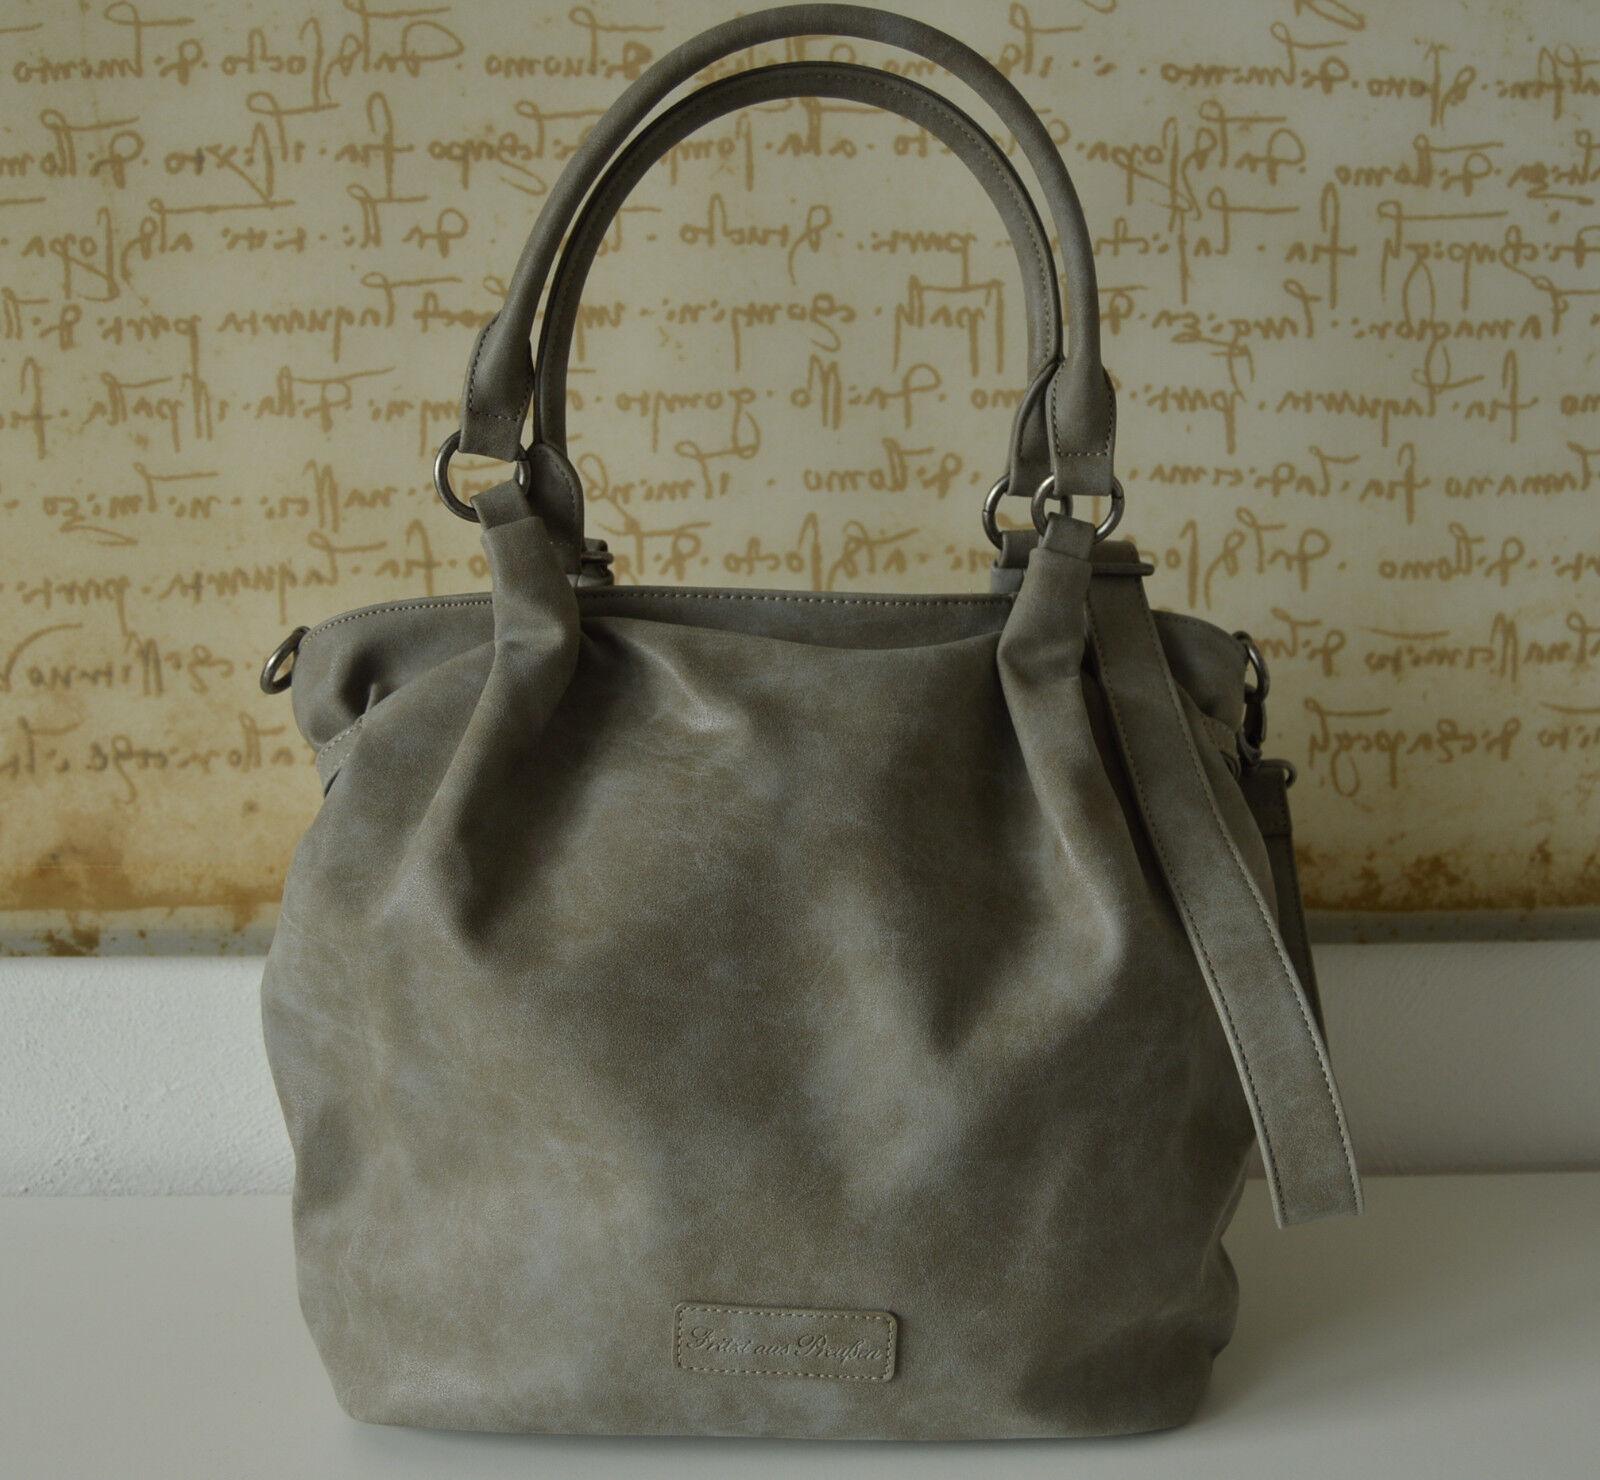 ac04498dc14b5 FRITZI AUS AUS AUS PREUßEN SALE Schultertasche Shopper KIANA Vintage Grau  Metal